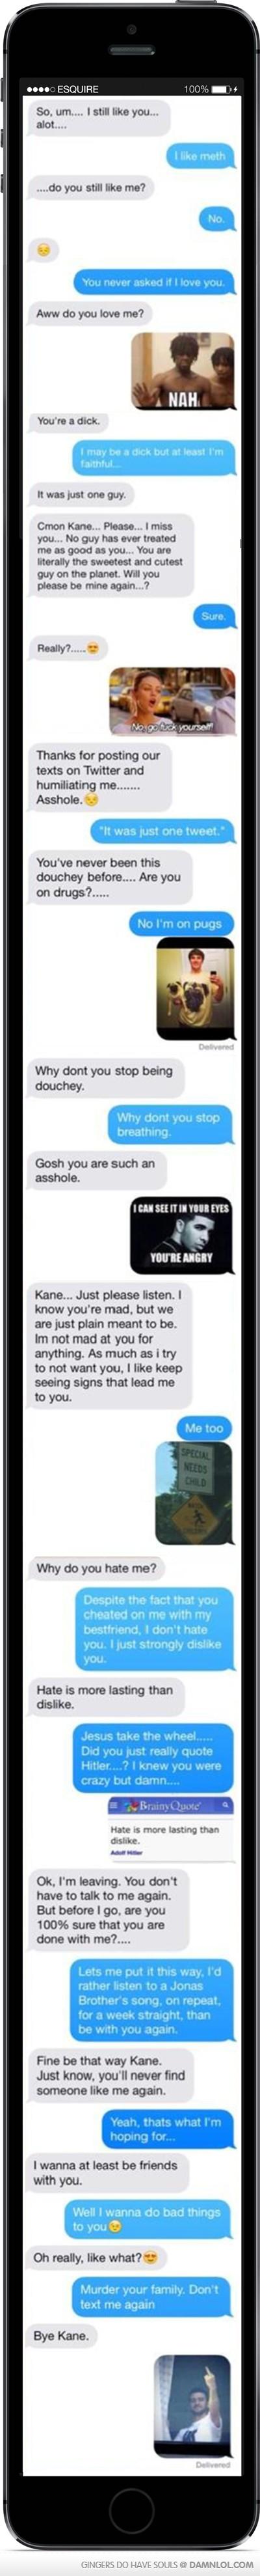 Cheating Girlfriend Text Memes